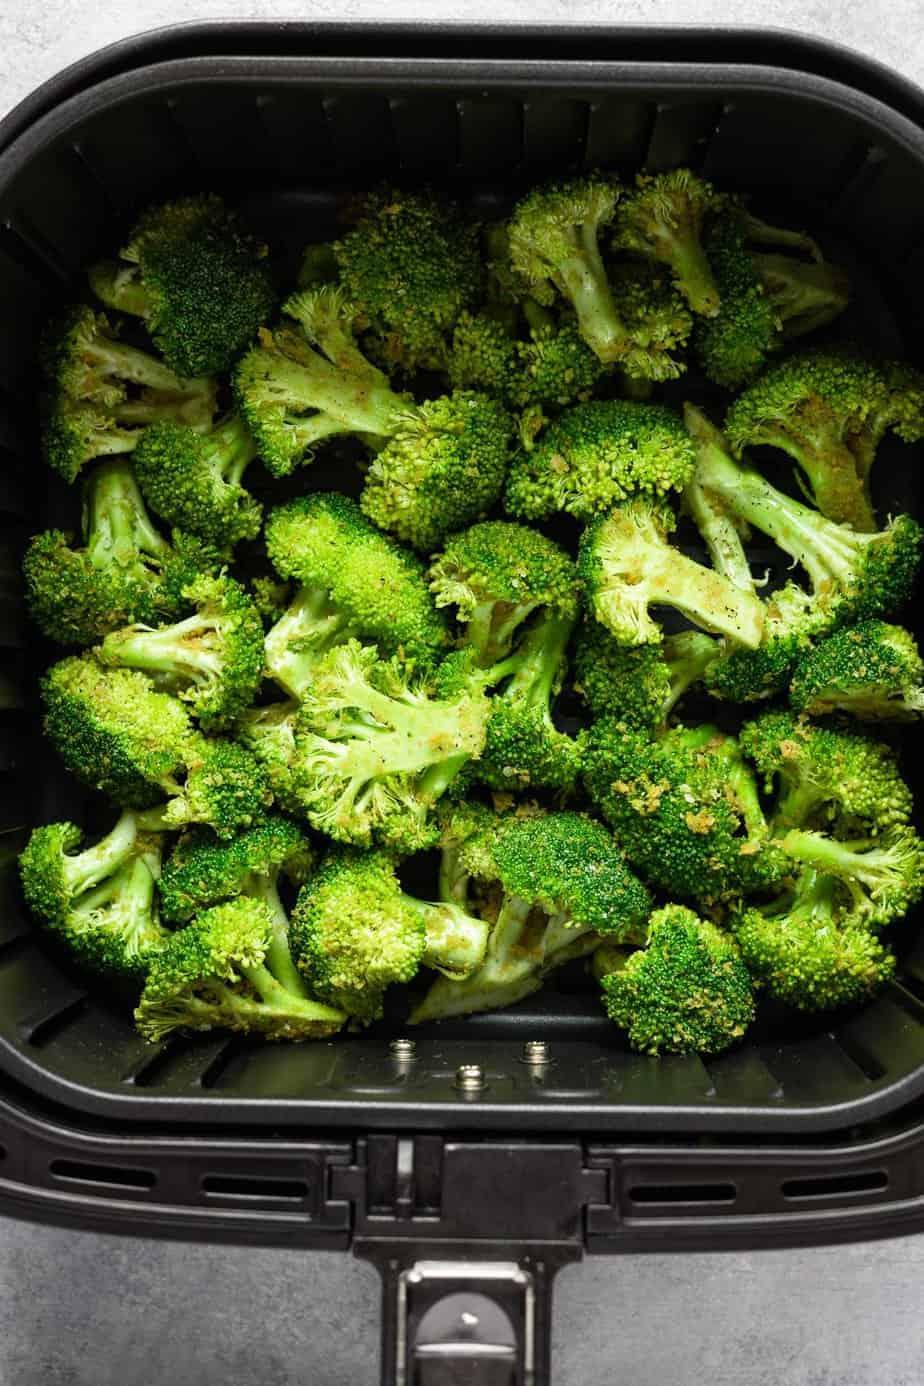 arranged broccoli inside the air fryer basket